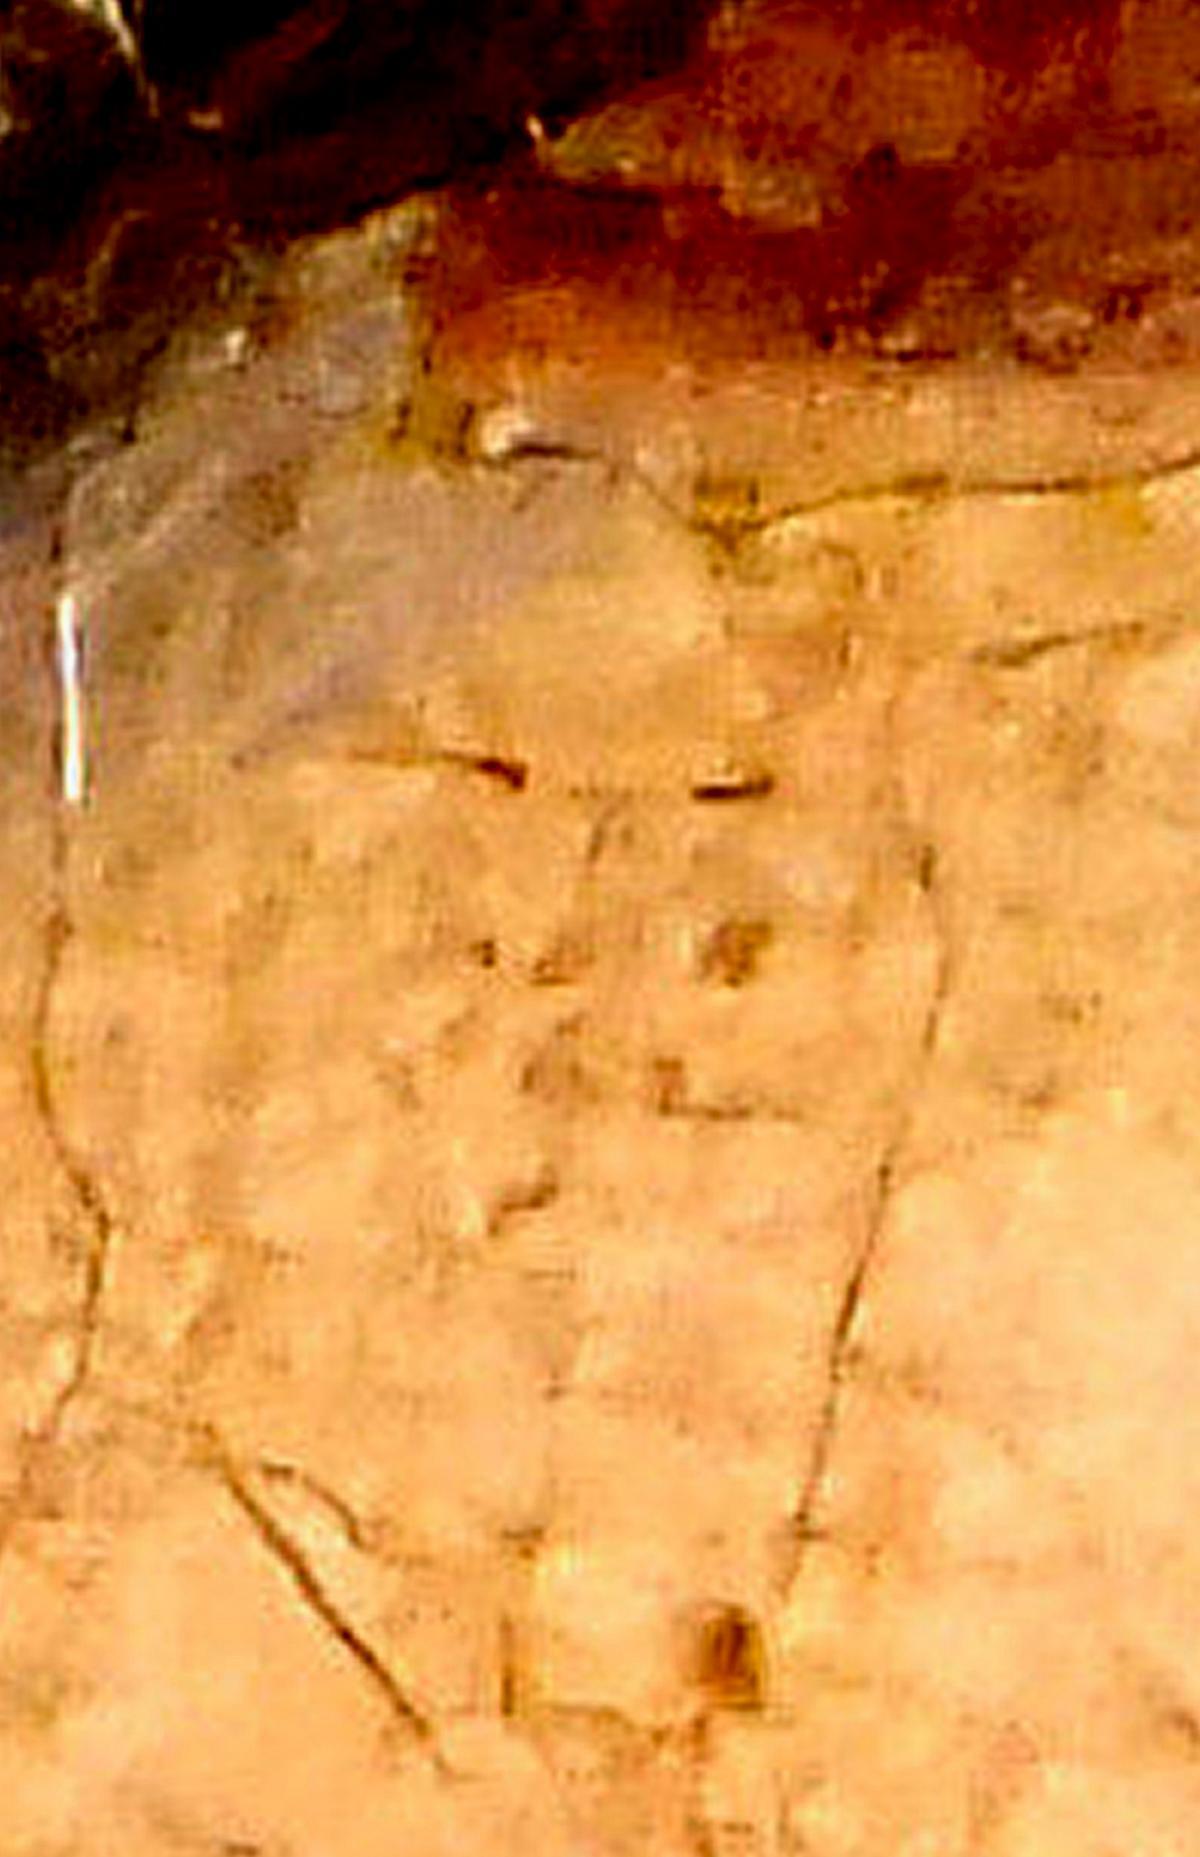 Artist Alexander Nasmyth Hid Secret Masonic Symbols In Paintings Of